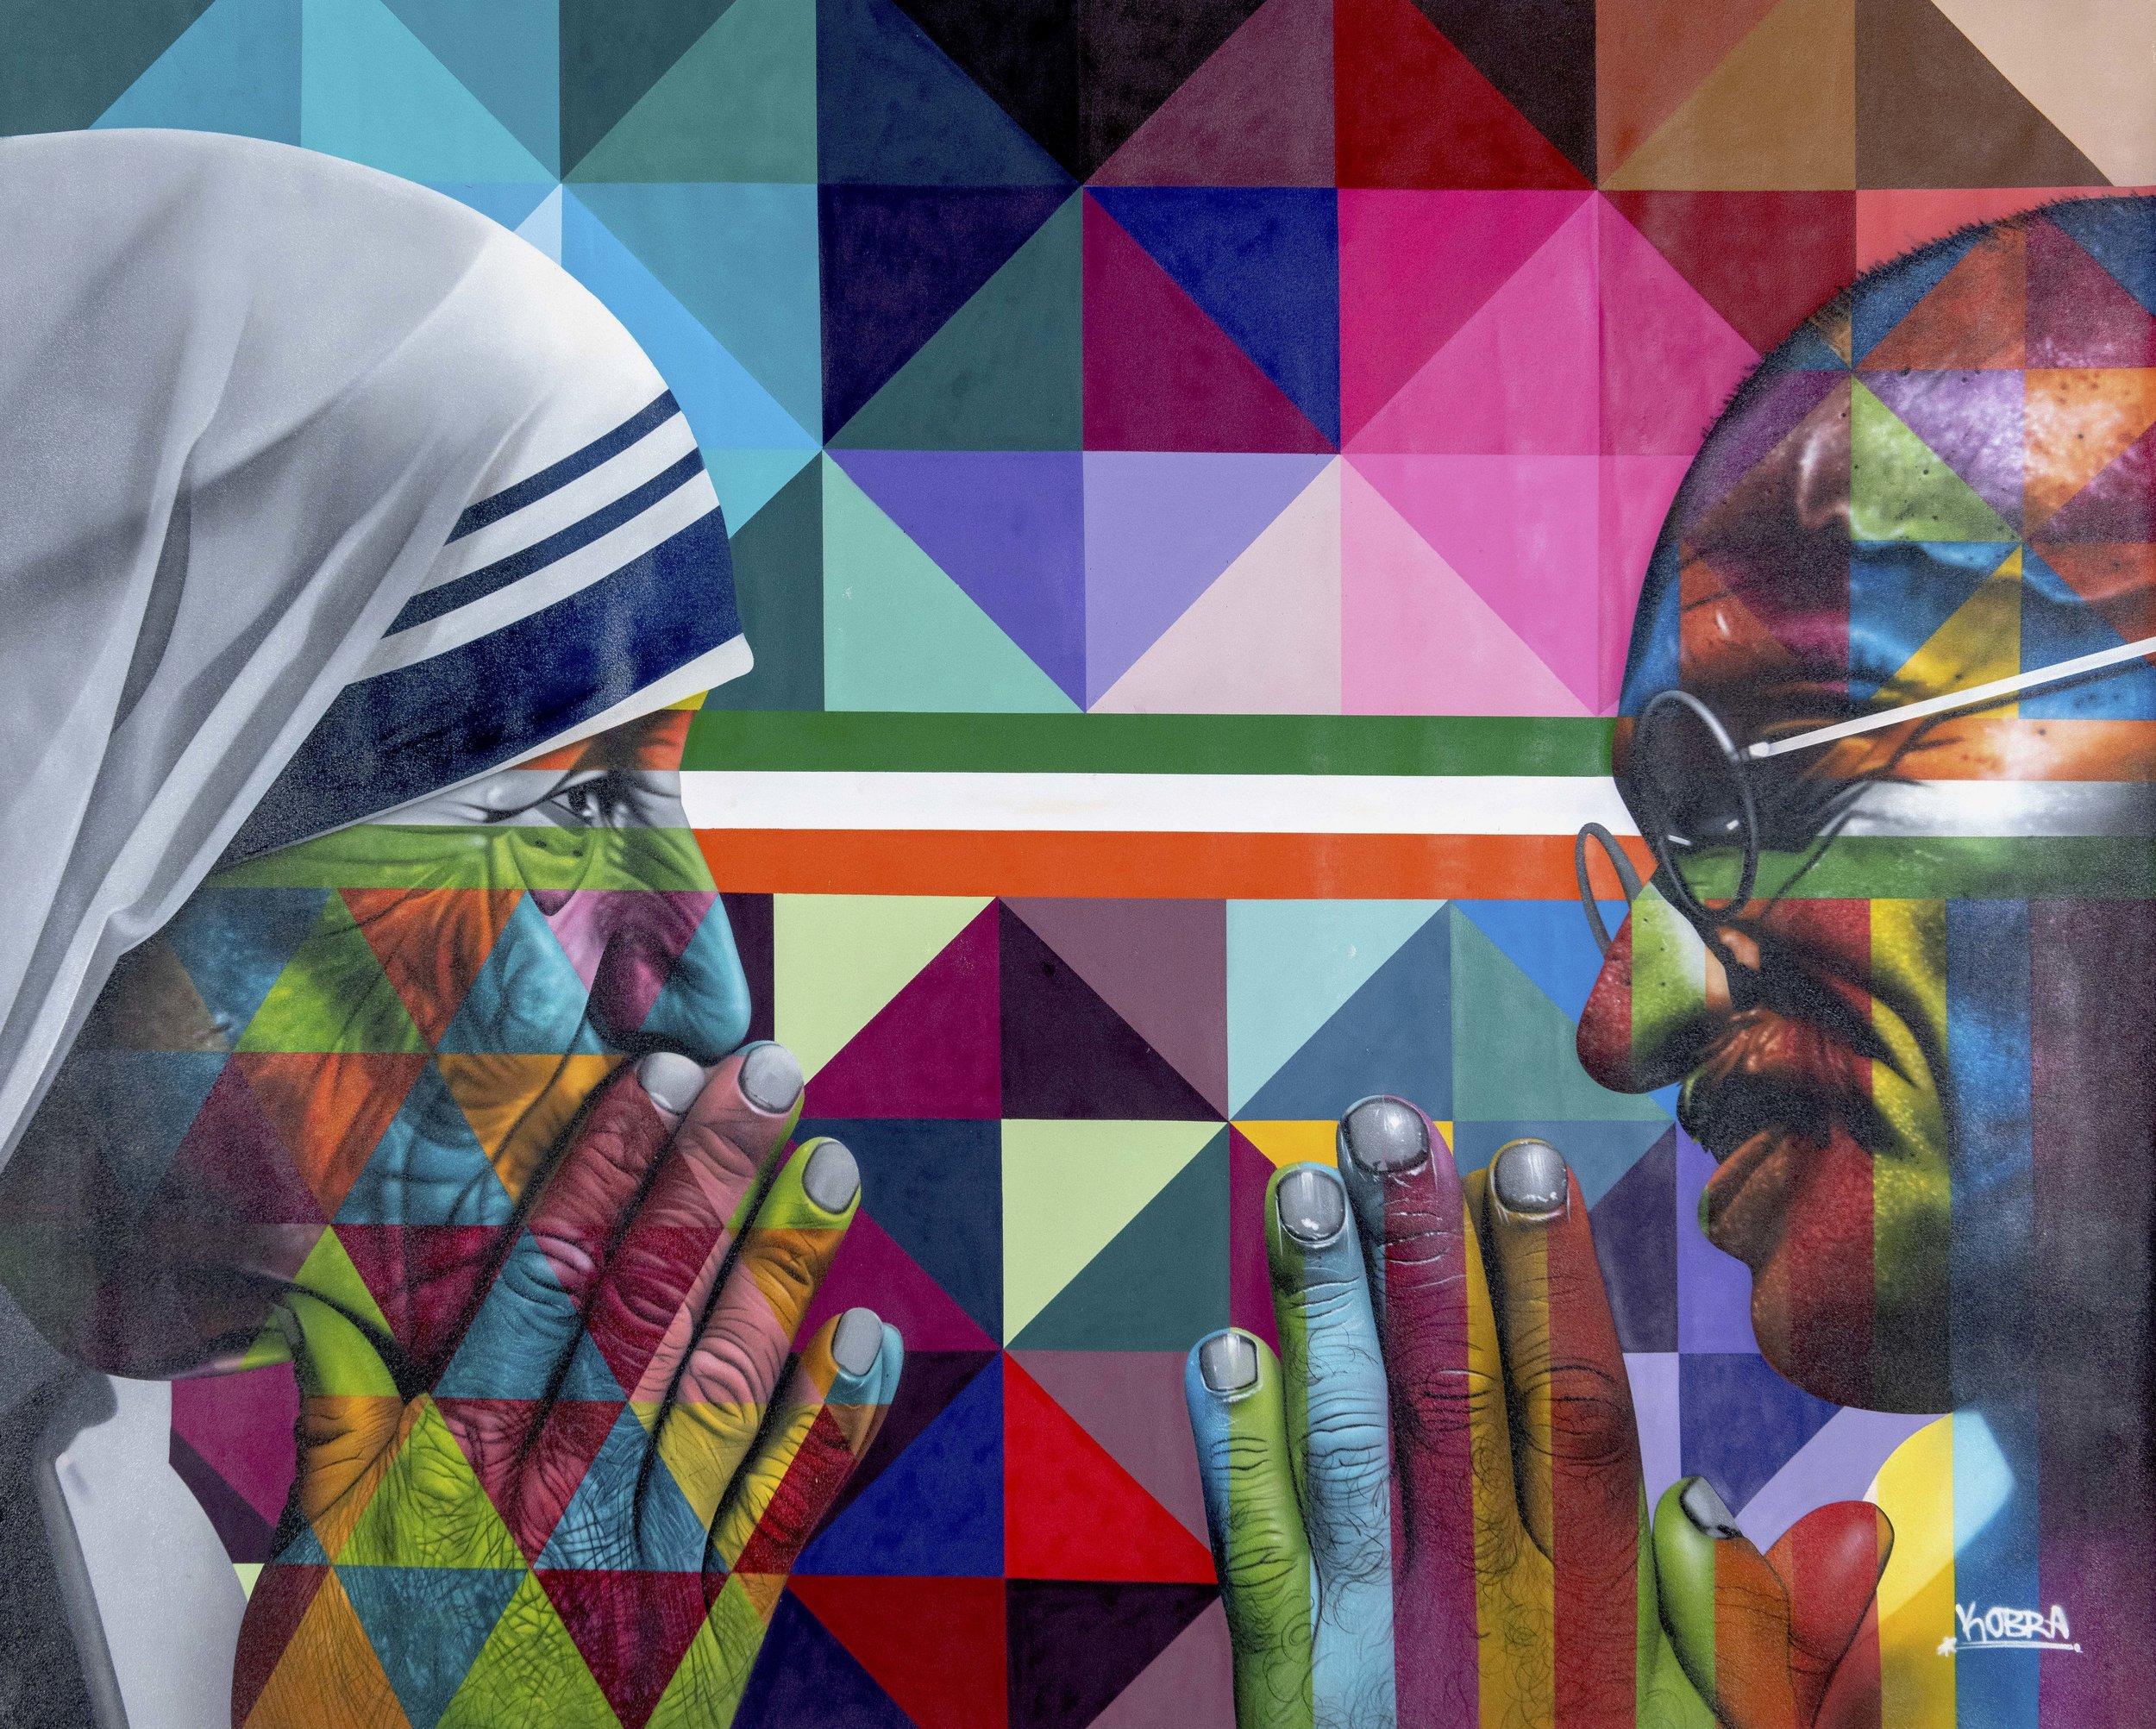 KOBRA  Tolerance  Mixed media on canvas  98 x 74 inches